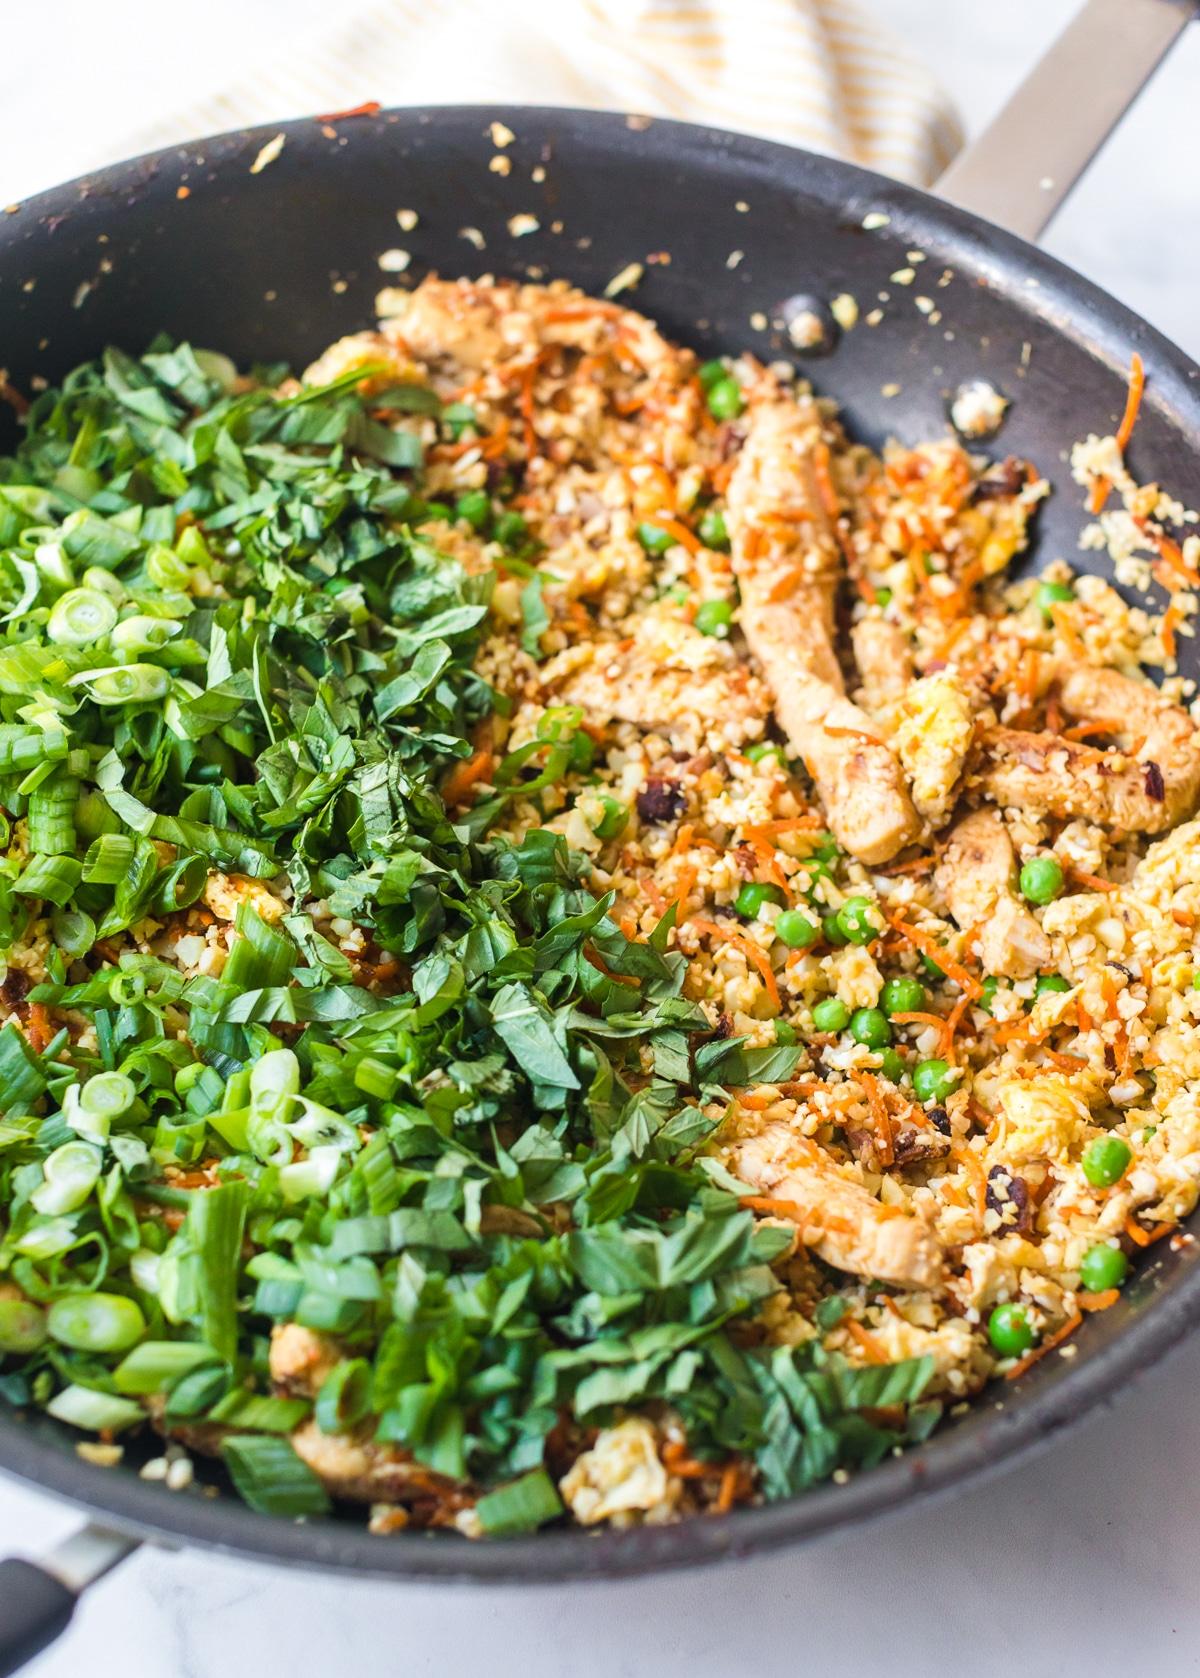 Keto Cauliflower Rice Recipe #ASpicyPerspective #cauliflower #chicken #paleo #keto #lowcarb